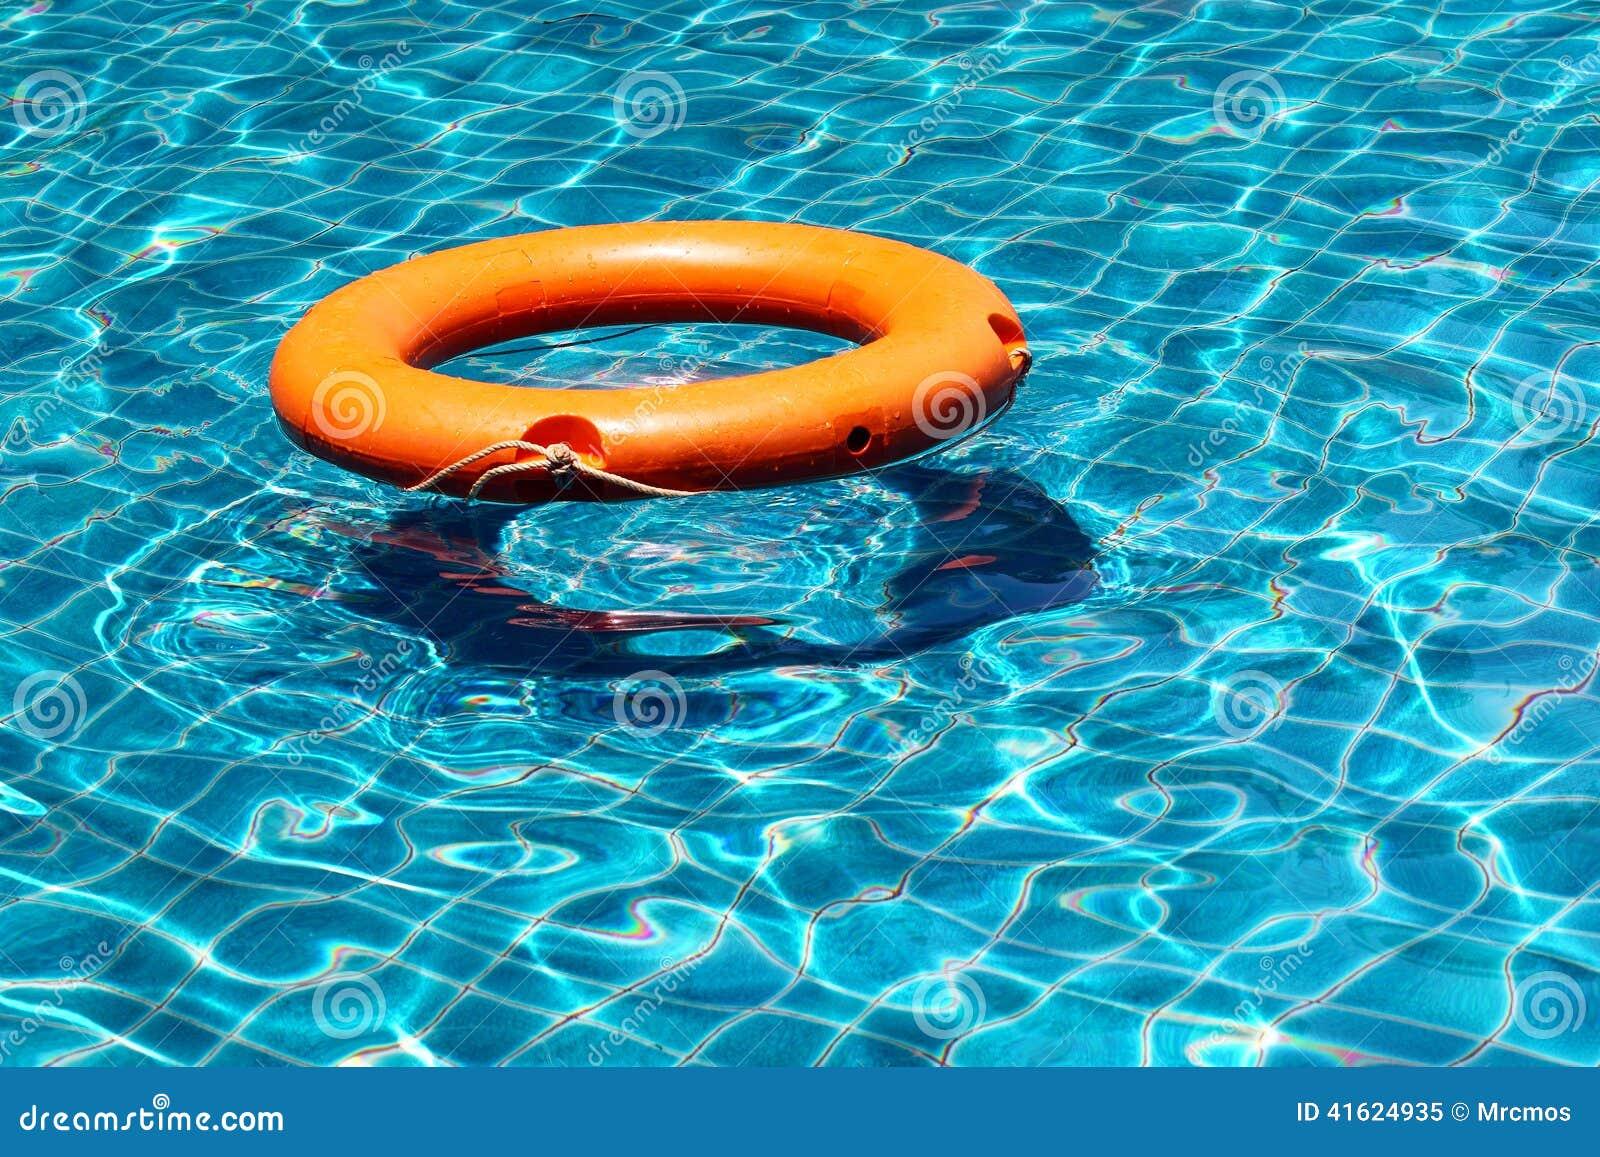 Orange Life Buoy Floating On The Surface Of Blue Water